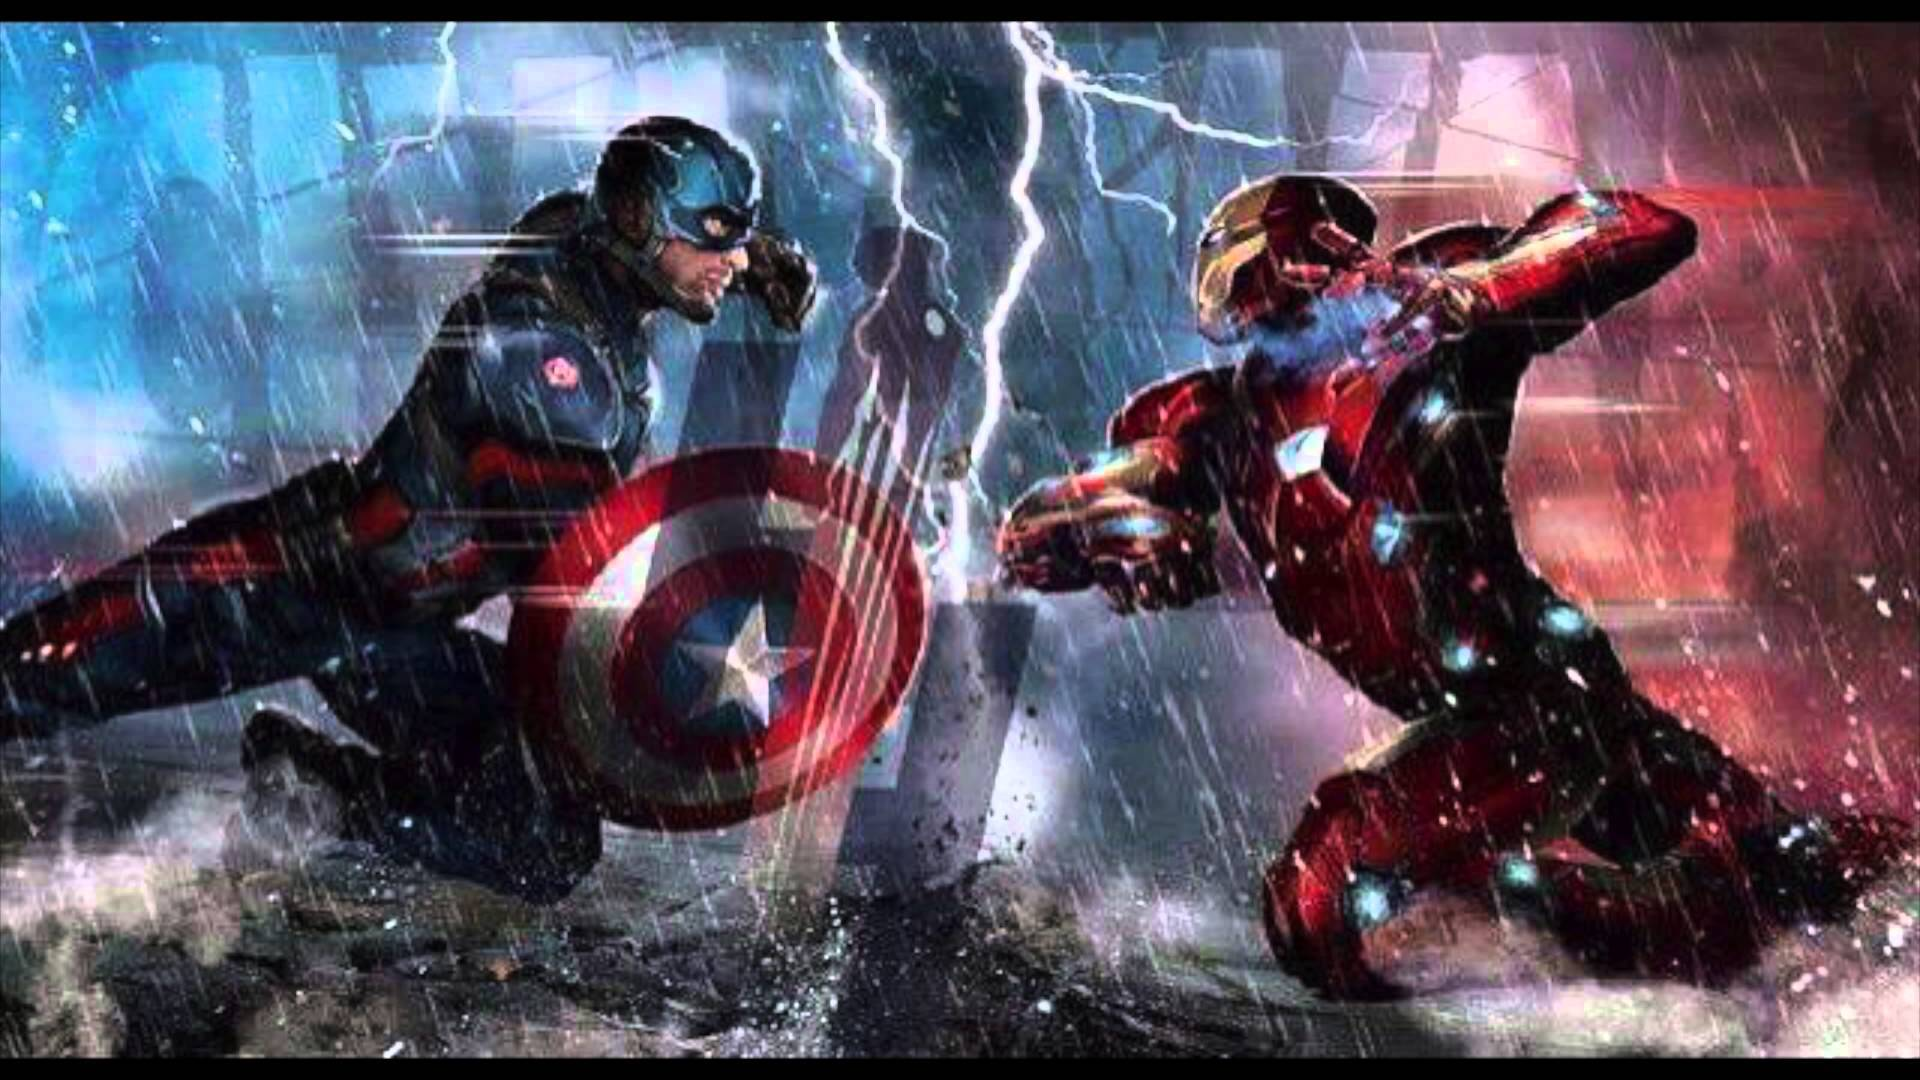 Captain America Civil War Wallpaper 4k: Captain America: Civil War Wallpapers Images Photos